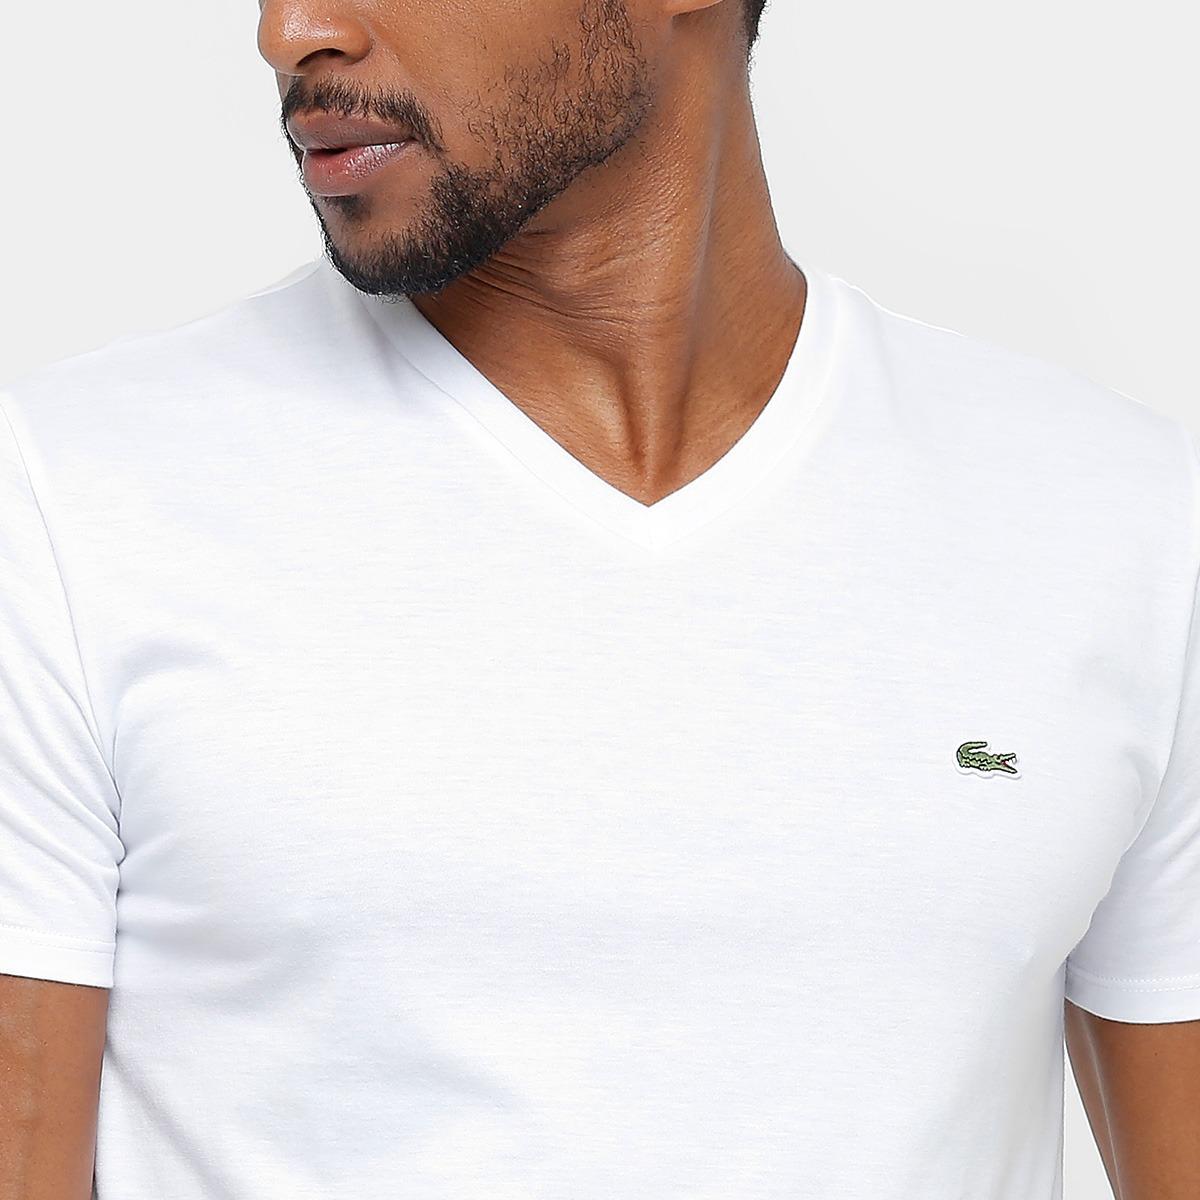 tshirt lacoste masculina peruana camiseta live 100% original. Carregando  zoom. 5c2d093959